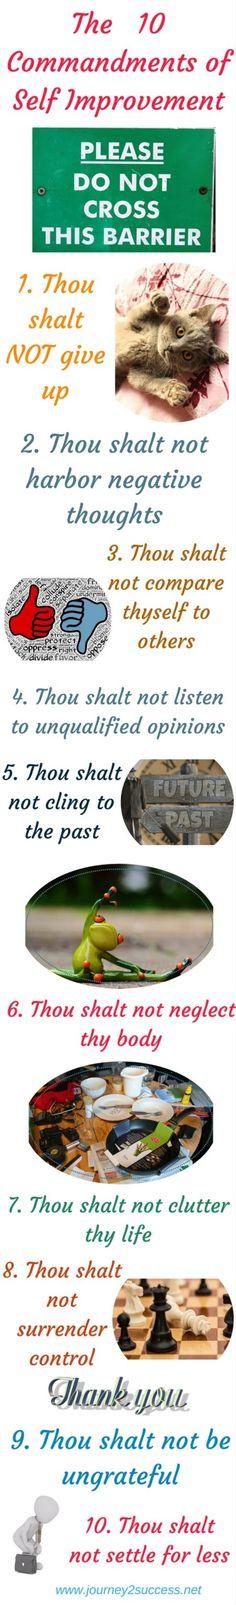 The ten commandments of self improvement - disregard them at your own peril